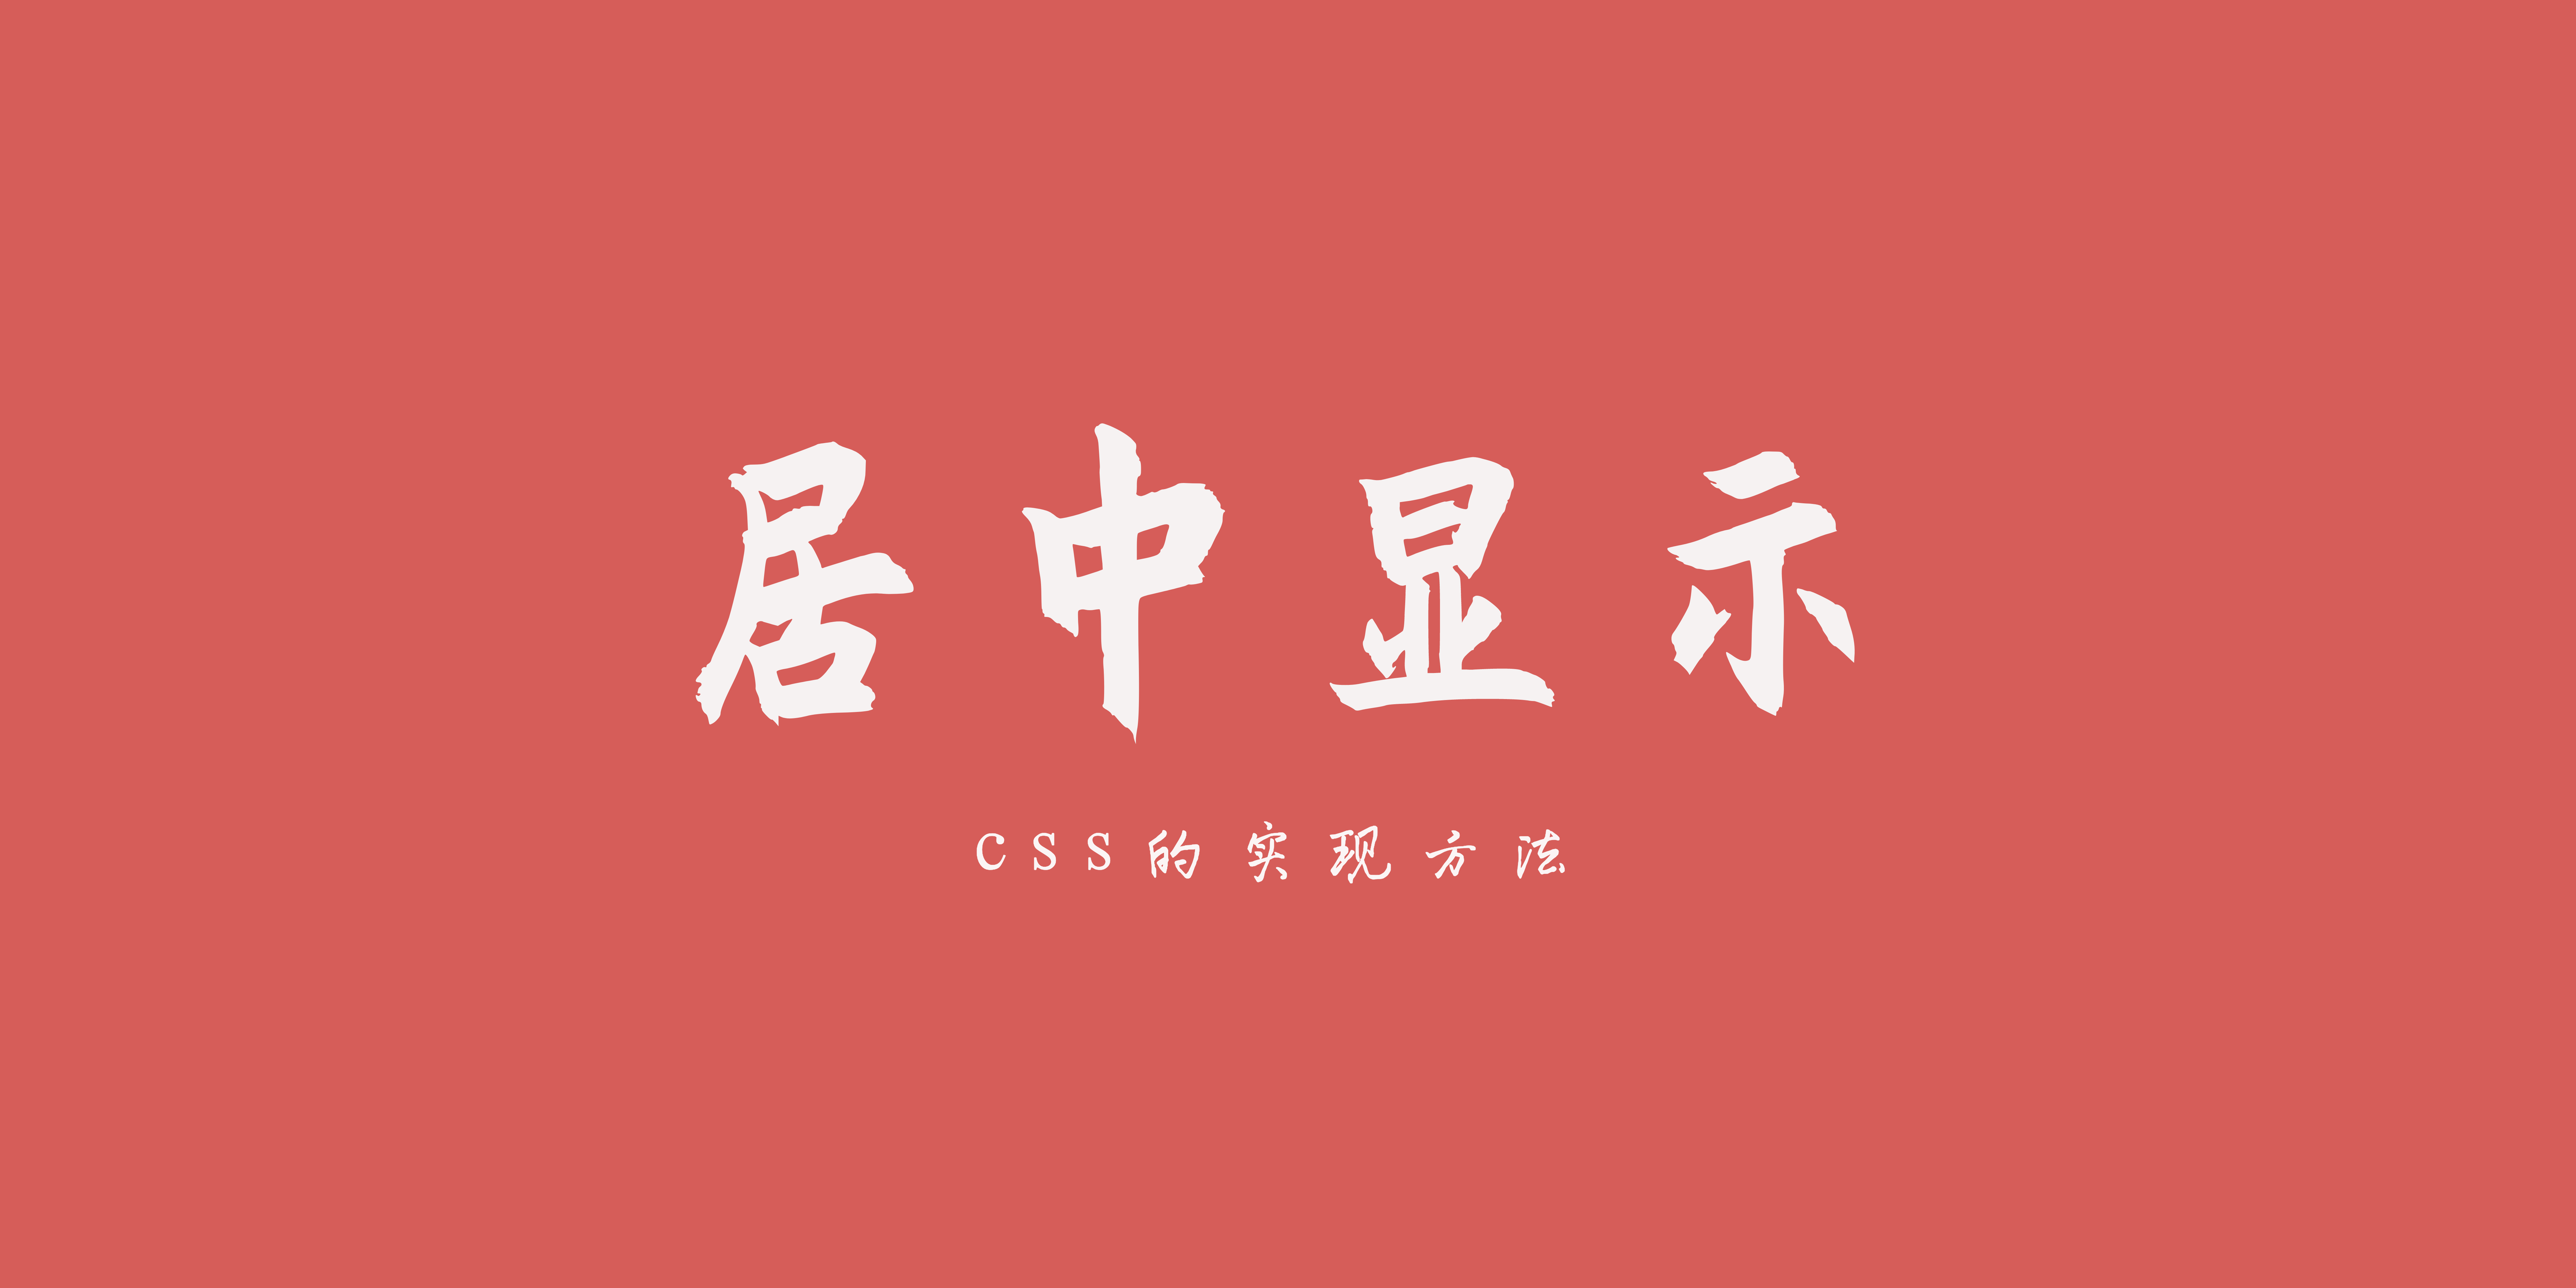 2020/02/21/CSS实现居中显示.html